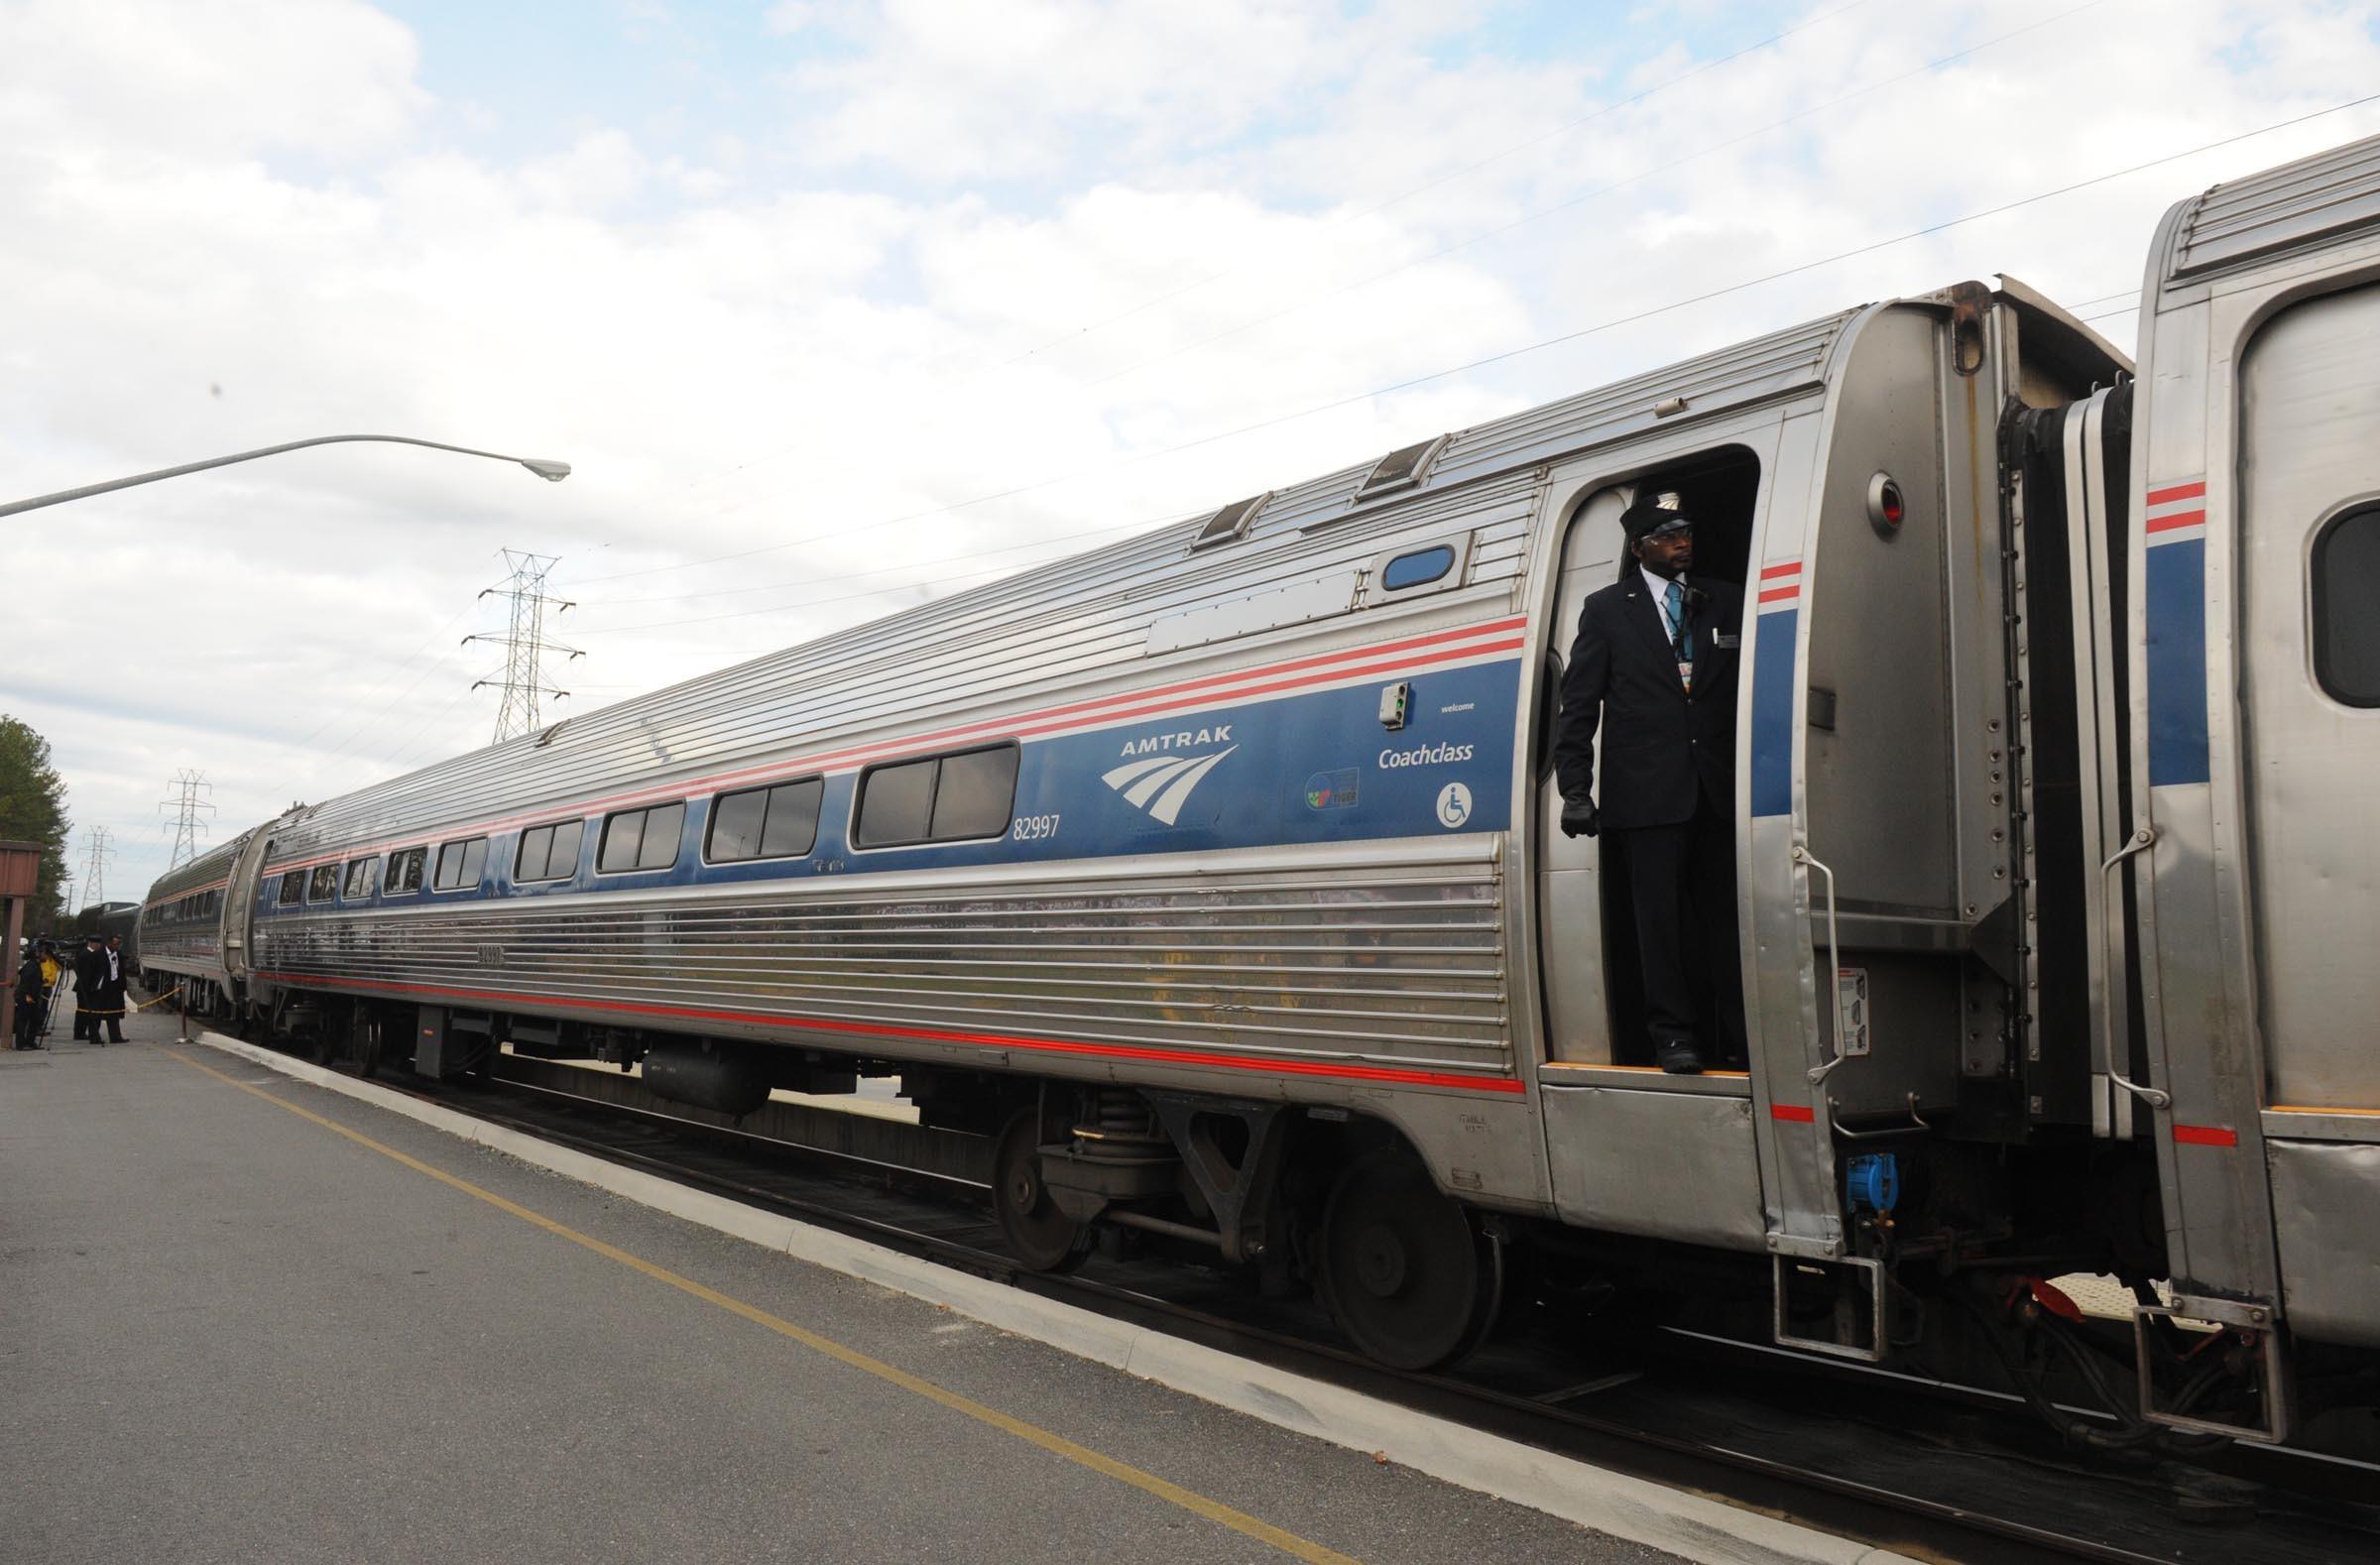 A new Amtrak line from Norfolk to Washington skips Main Street Station. - SCOTT ELMQUIST